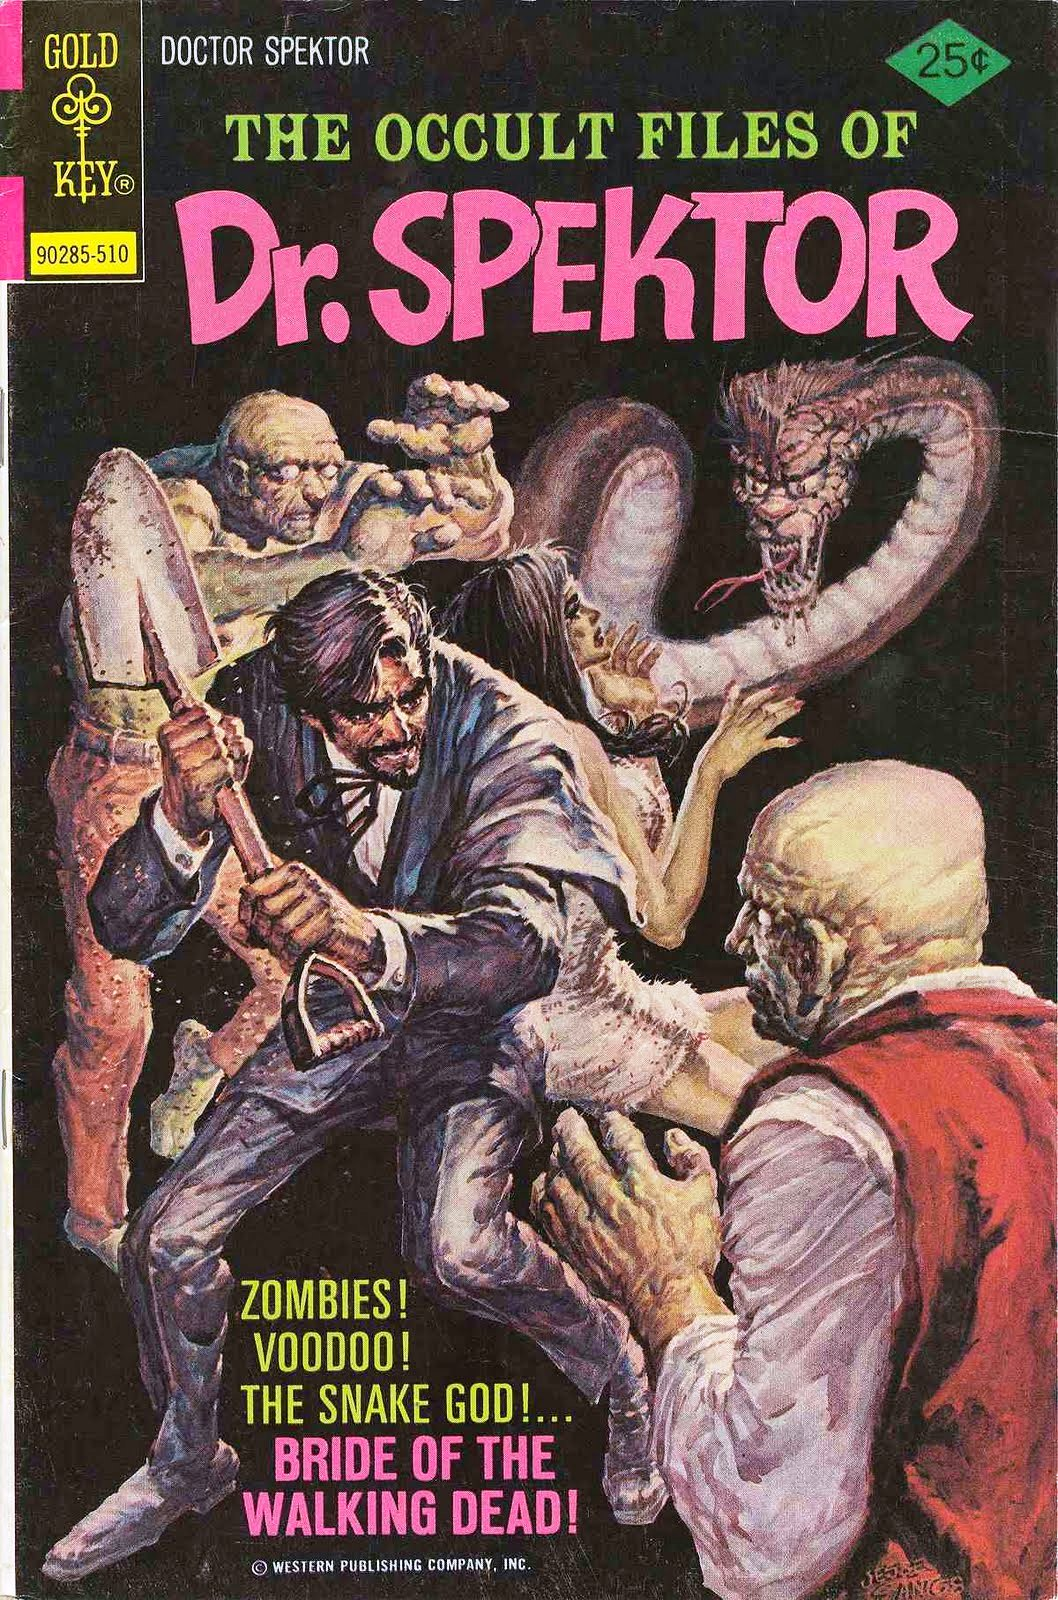 Occult Files of Dr. Spektor Vol 1 17